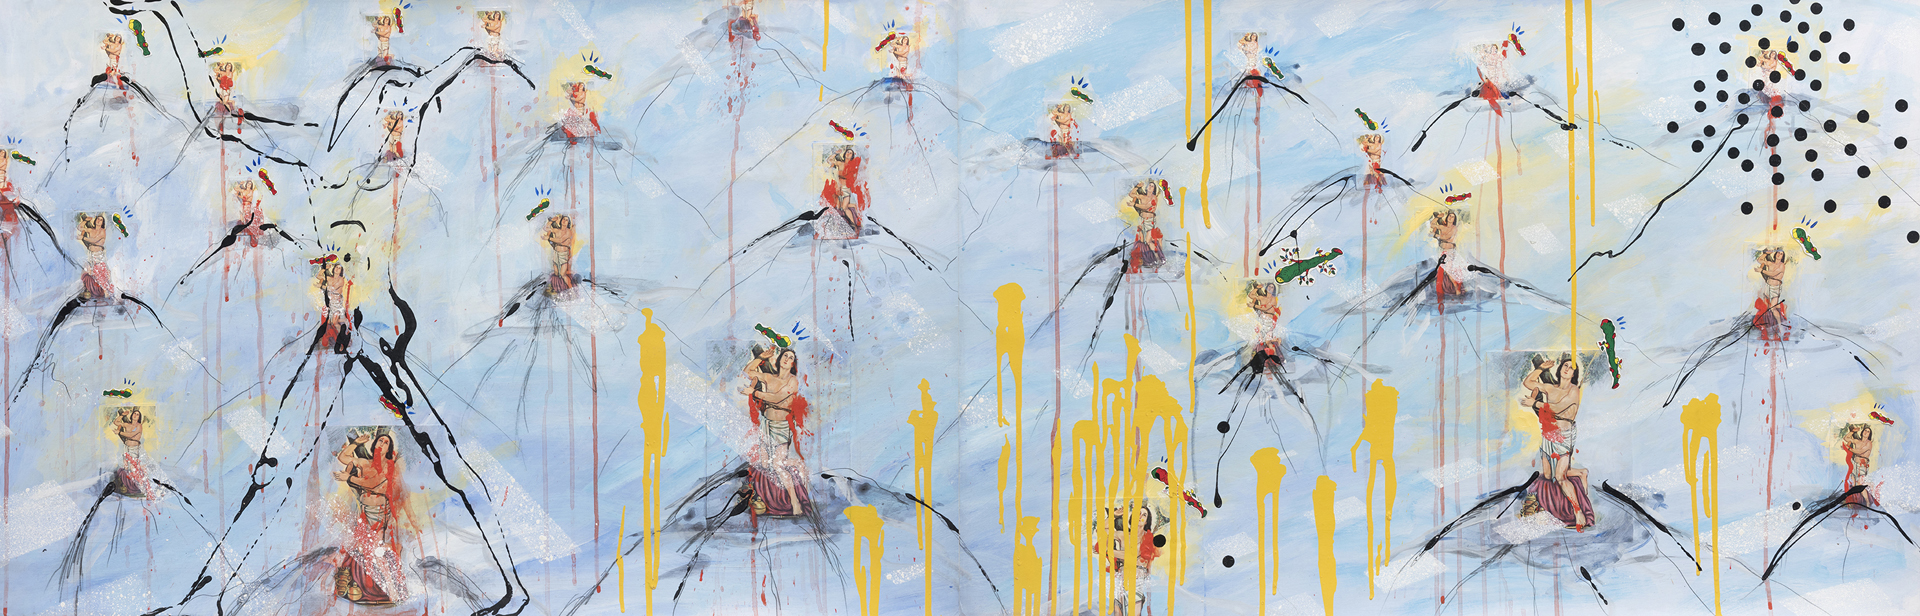 Sin título, 1988 Acrílico, collage y grafito sobre papel, 65 x 200 cm. Acervo Alfredo Londaibere. (Gonzalo Maggi)